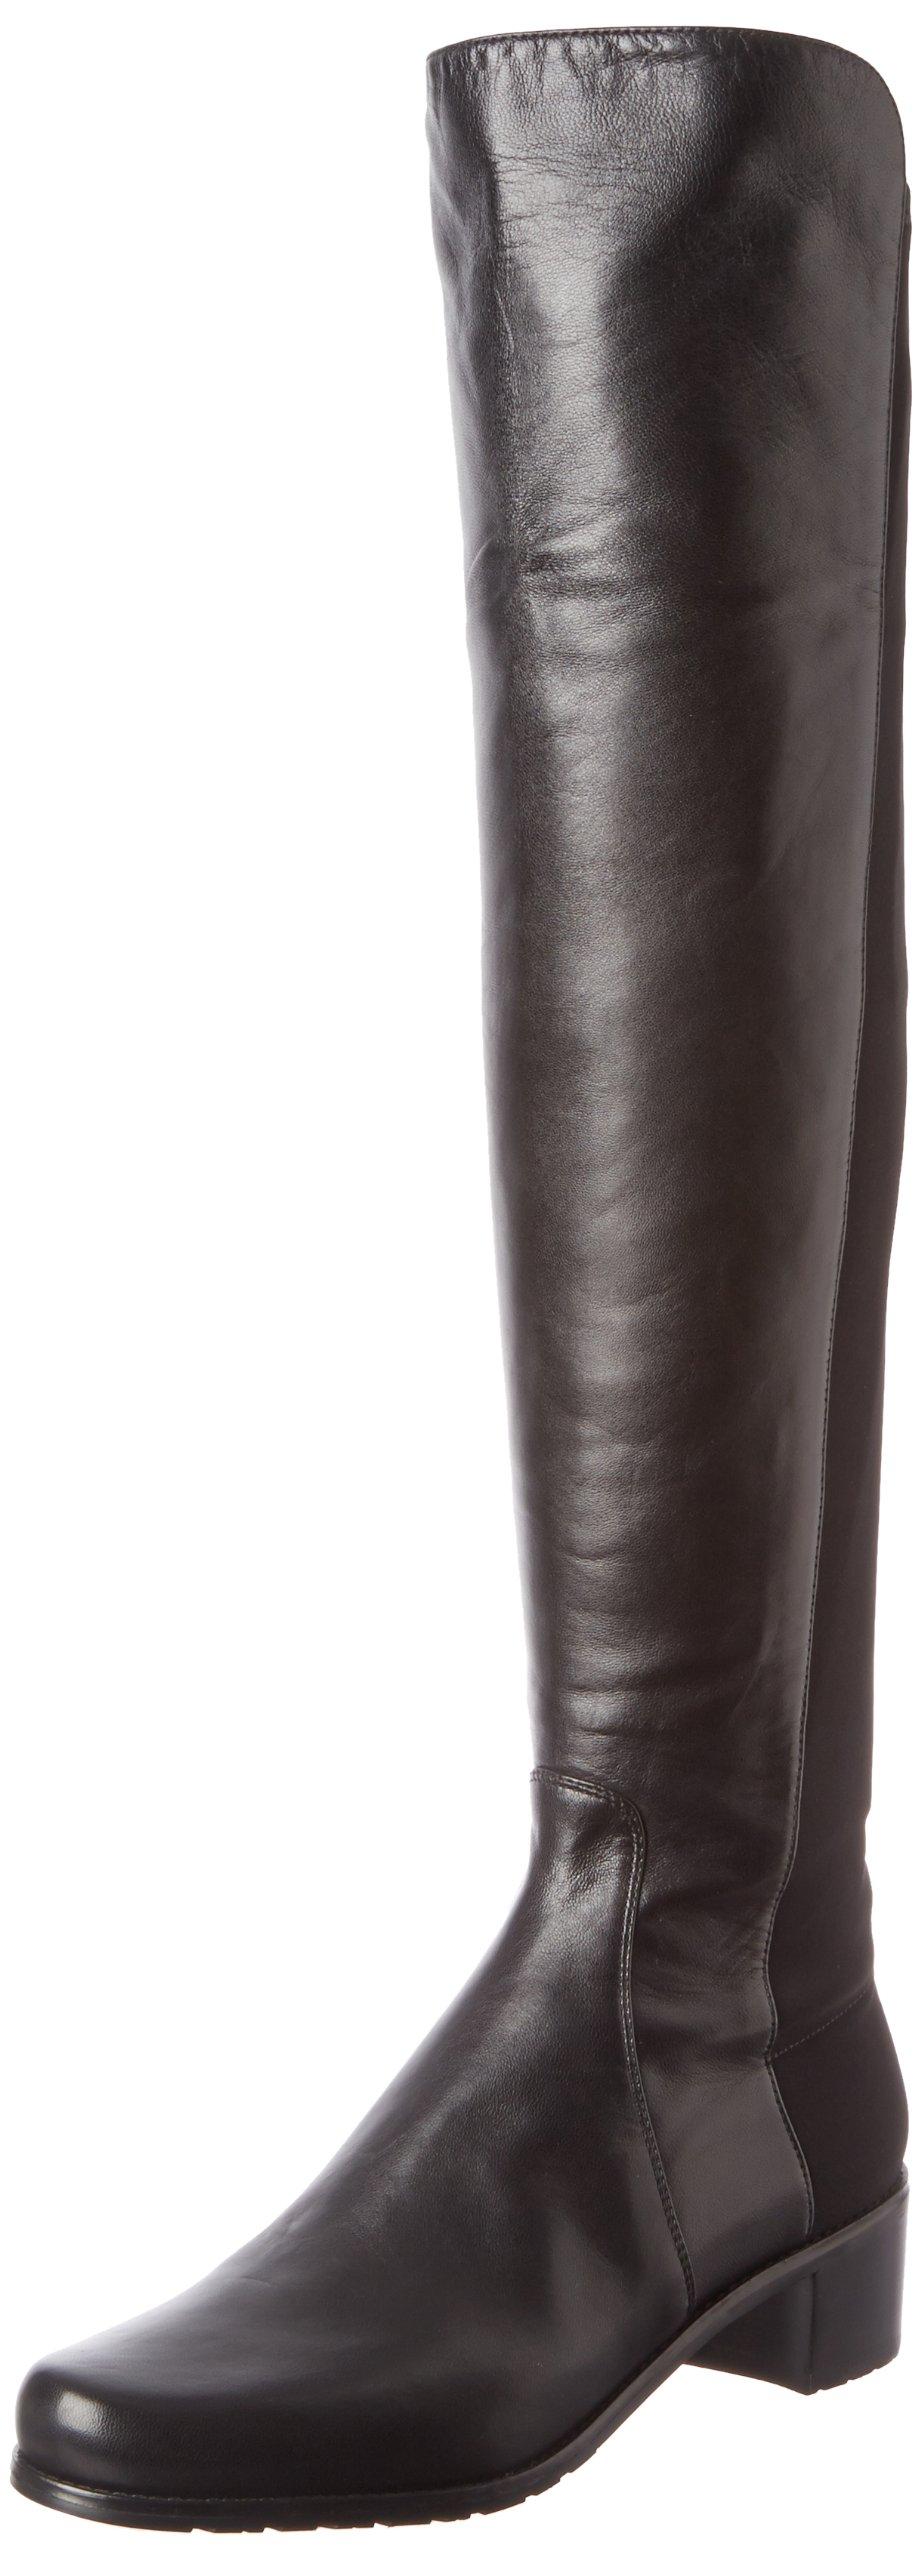 Stuart Weitzman Women's Reserve Boot,Black,7.5 M US